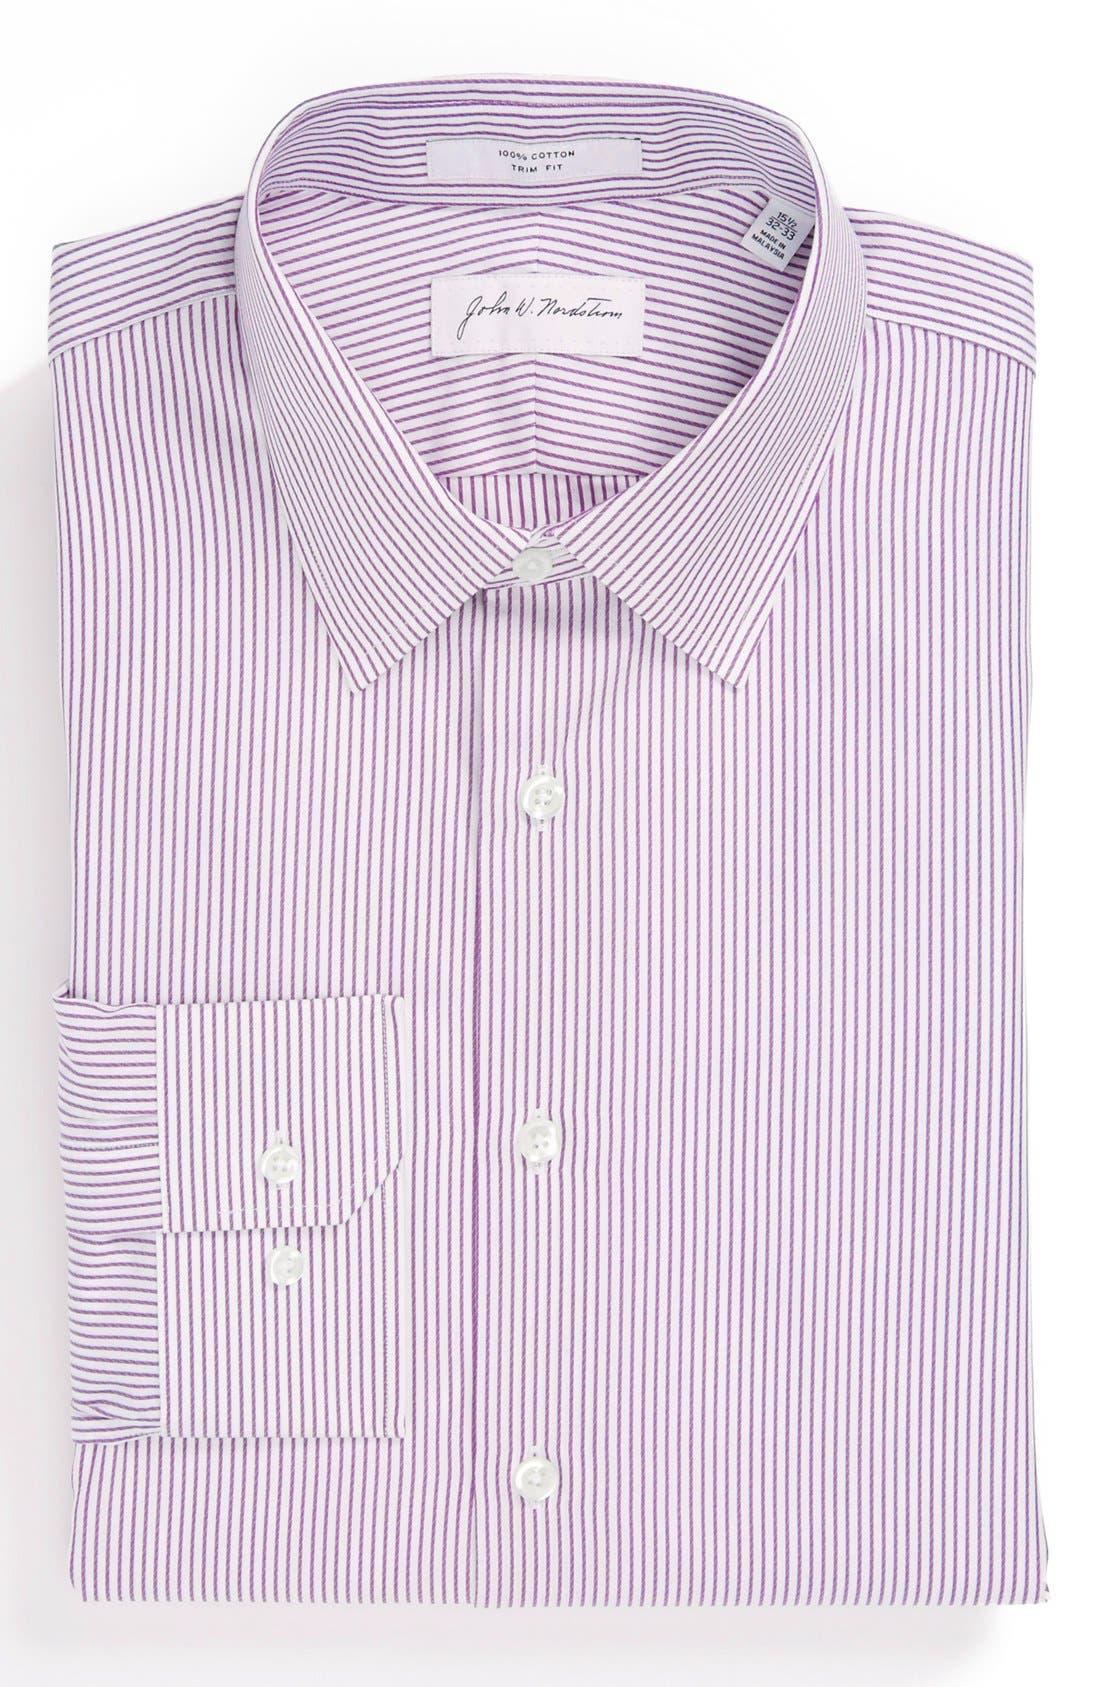 Main Image - John W. Nordstrom Trim Fit Stripe Dress Shirt